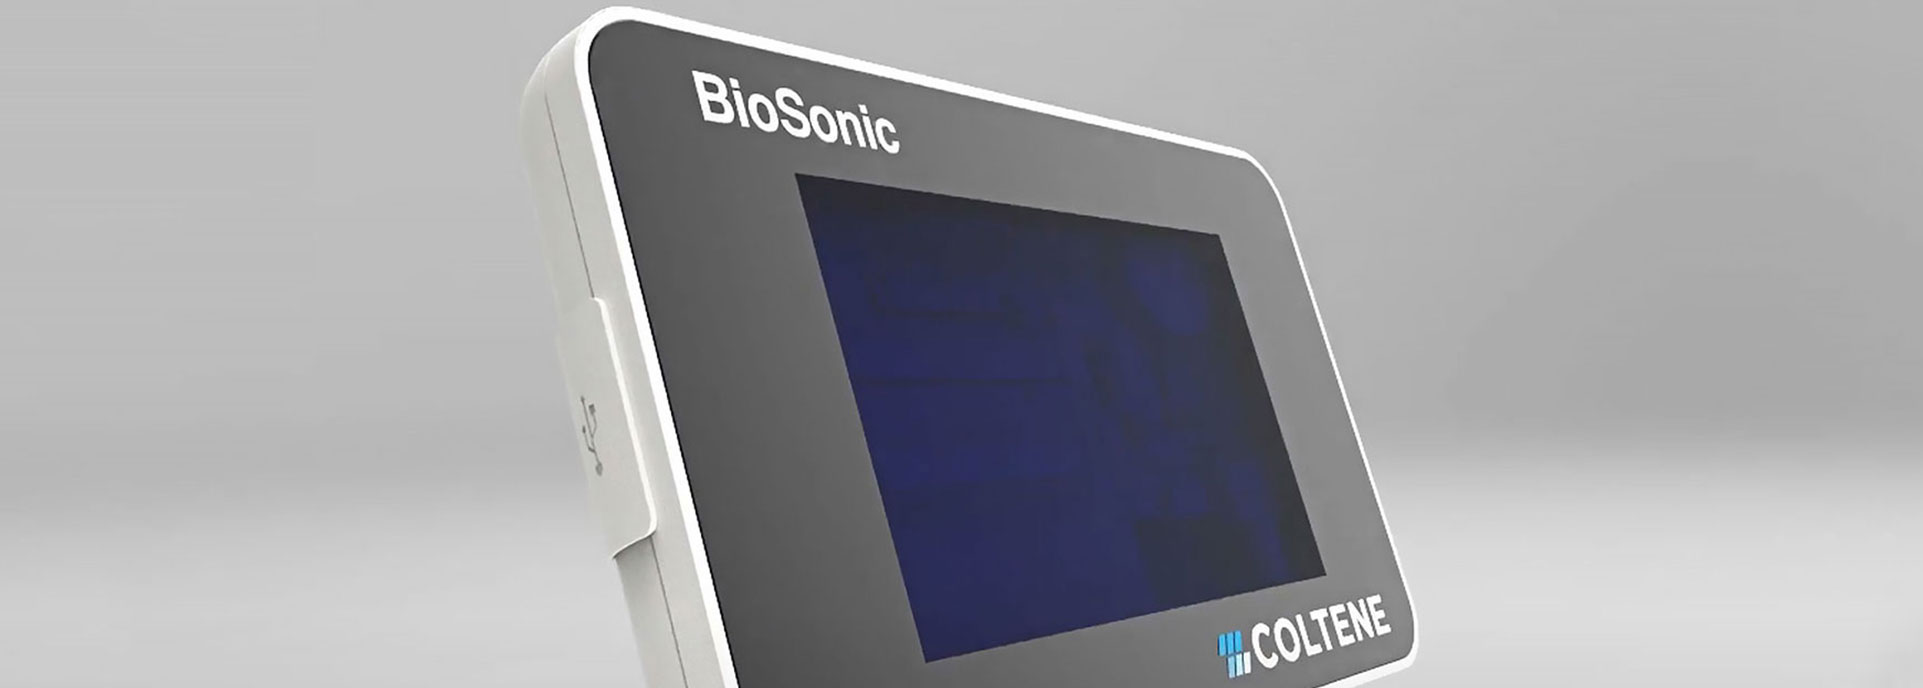 BioSonic_USB_2